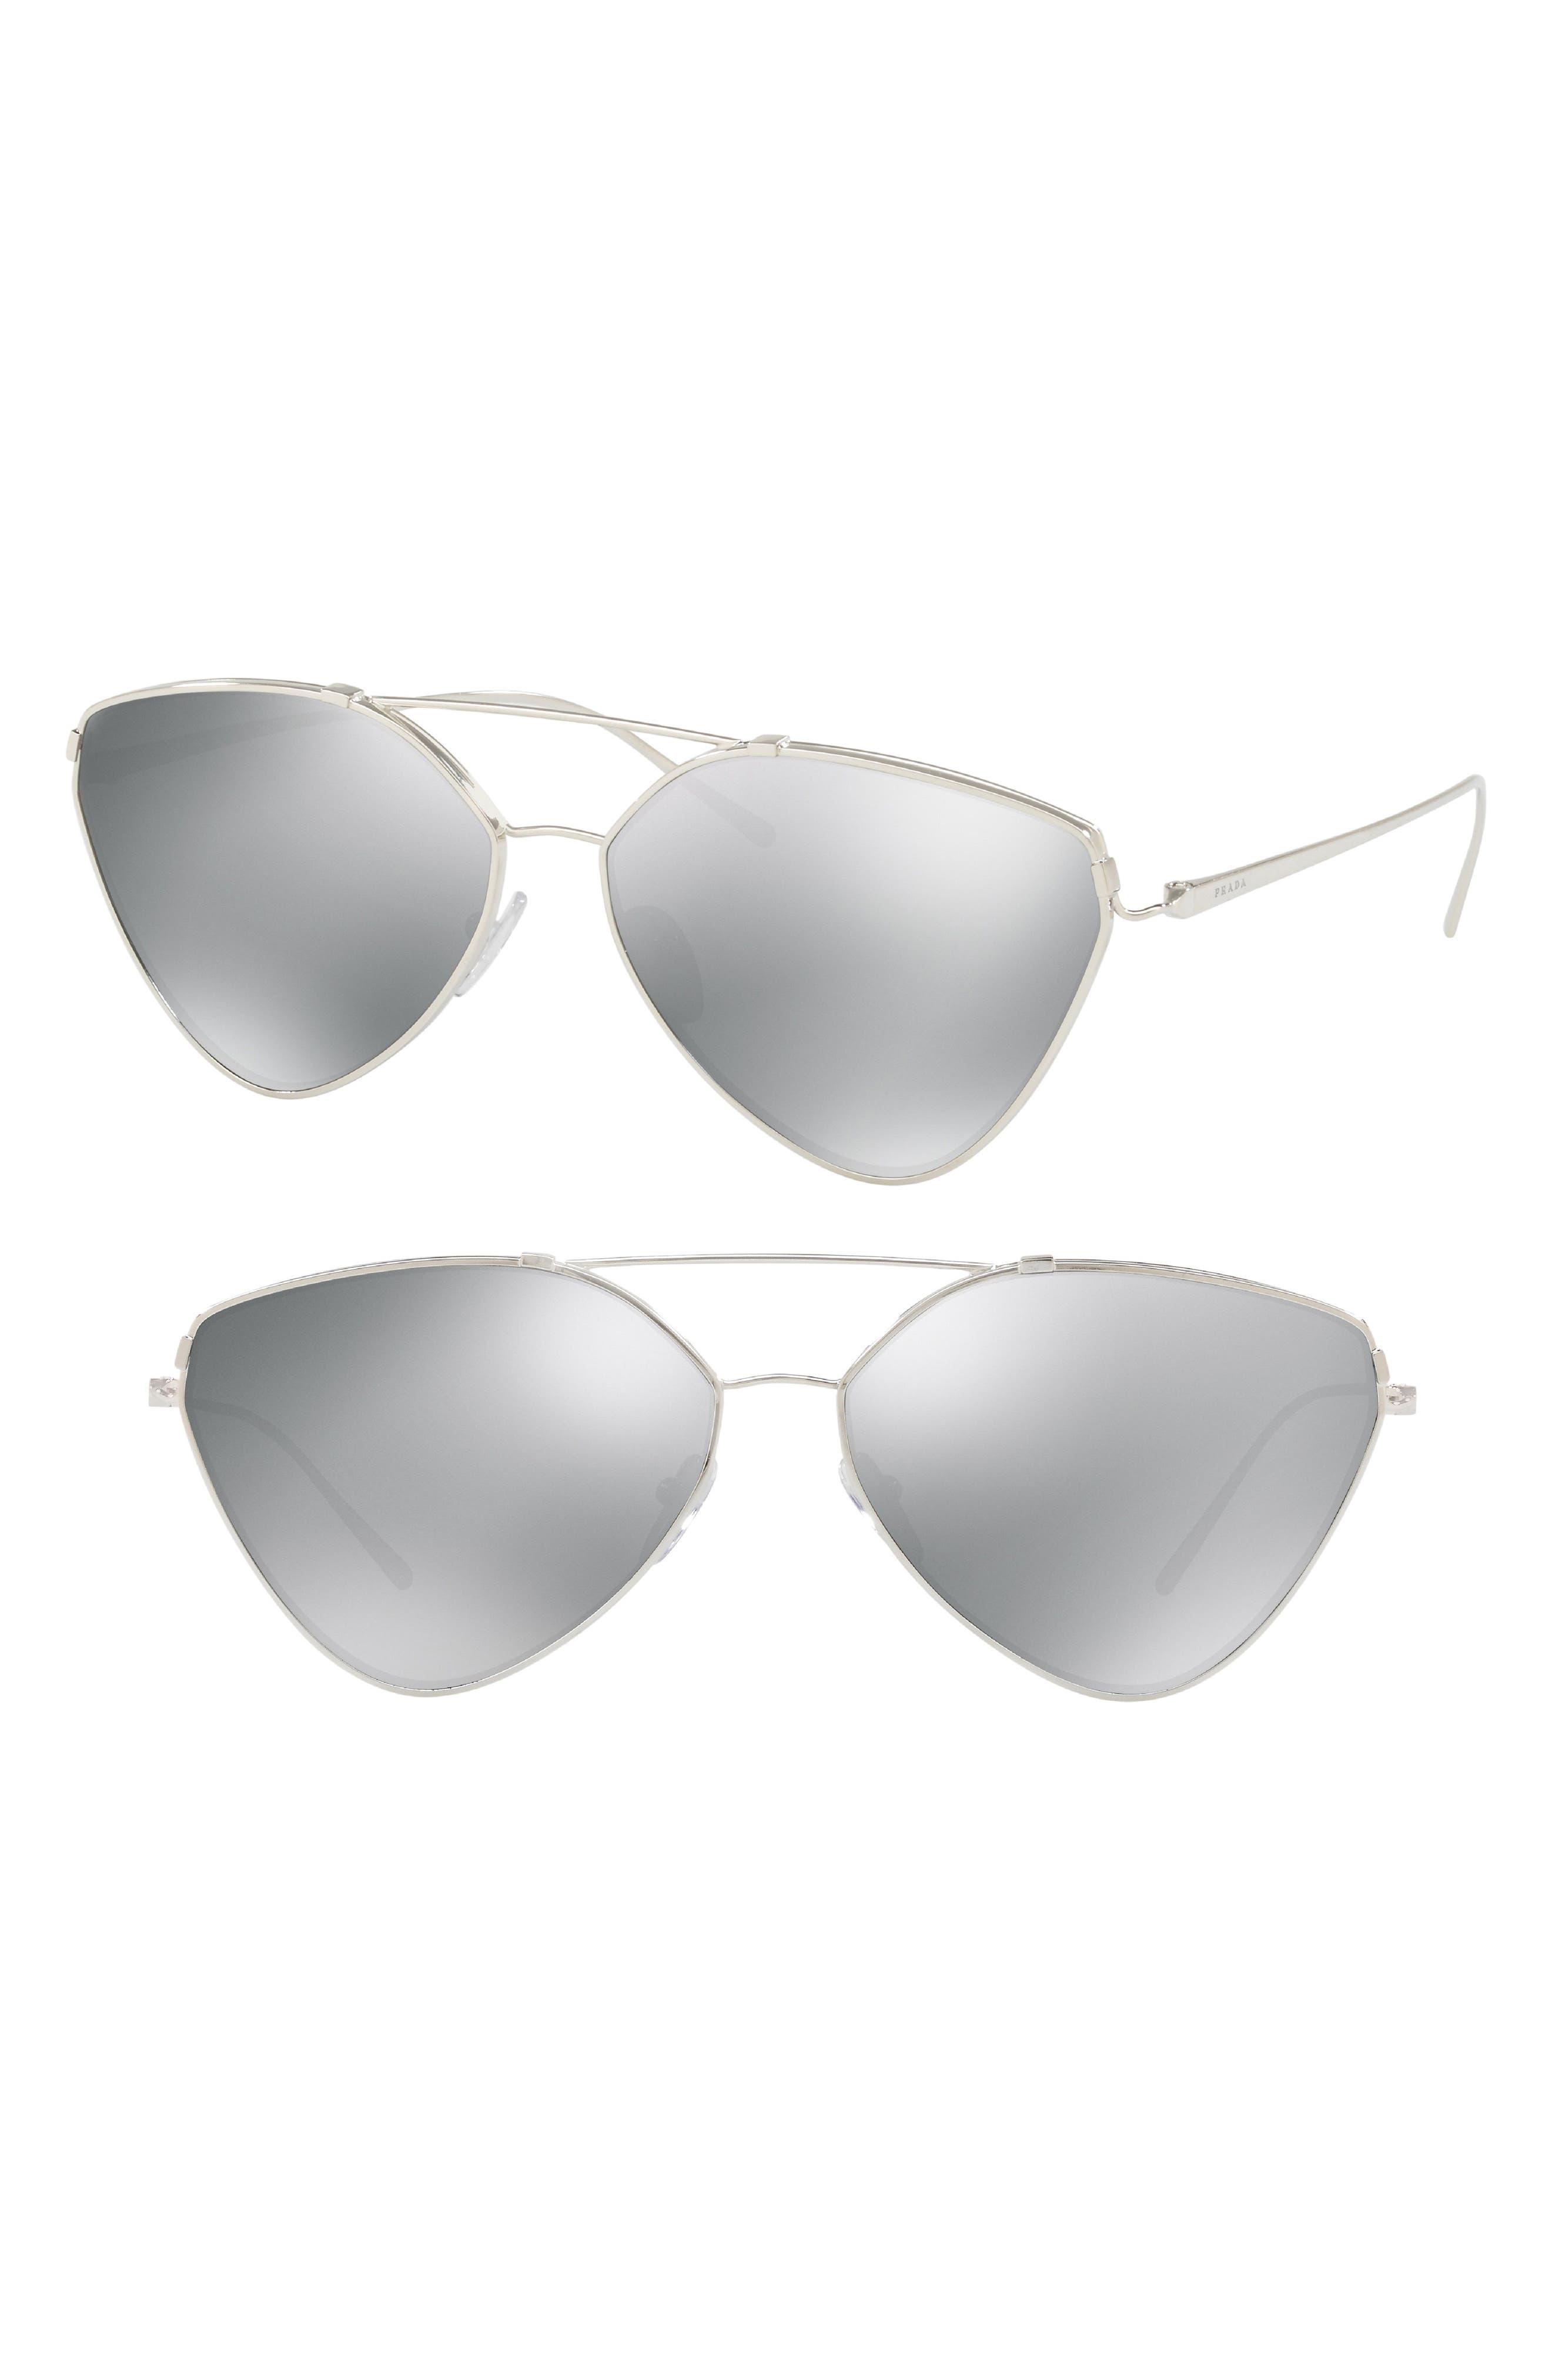 62mm Polarized Oversize Aviator Sunglasses,                             Alternate thumbnail 2, color,                             042